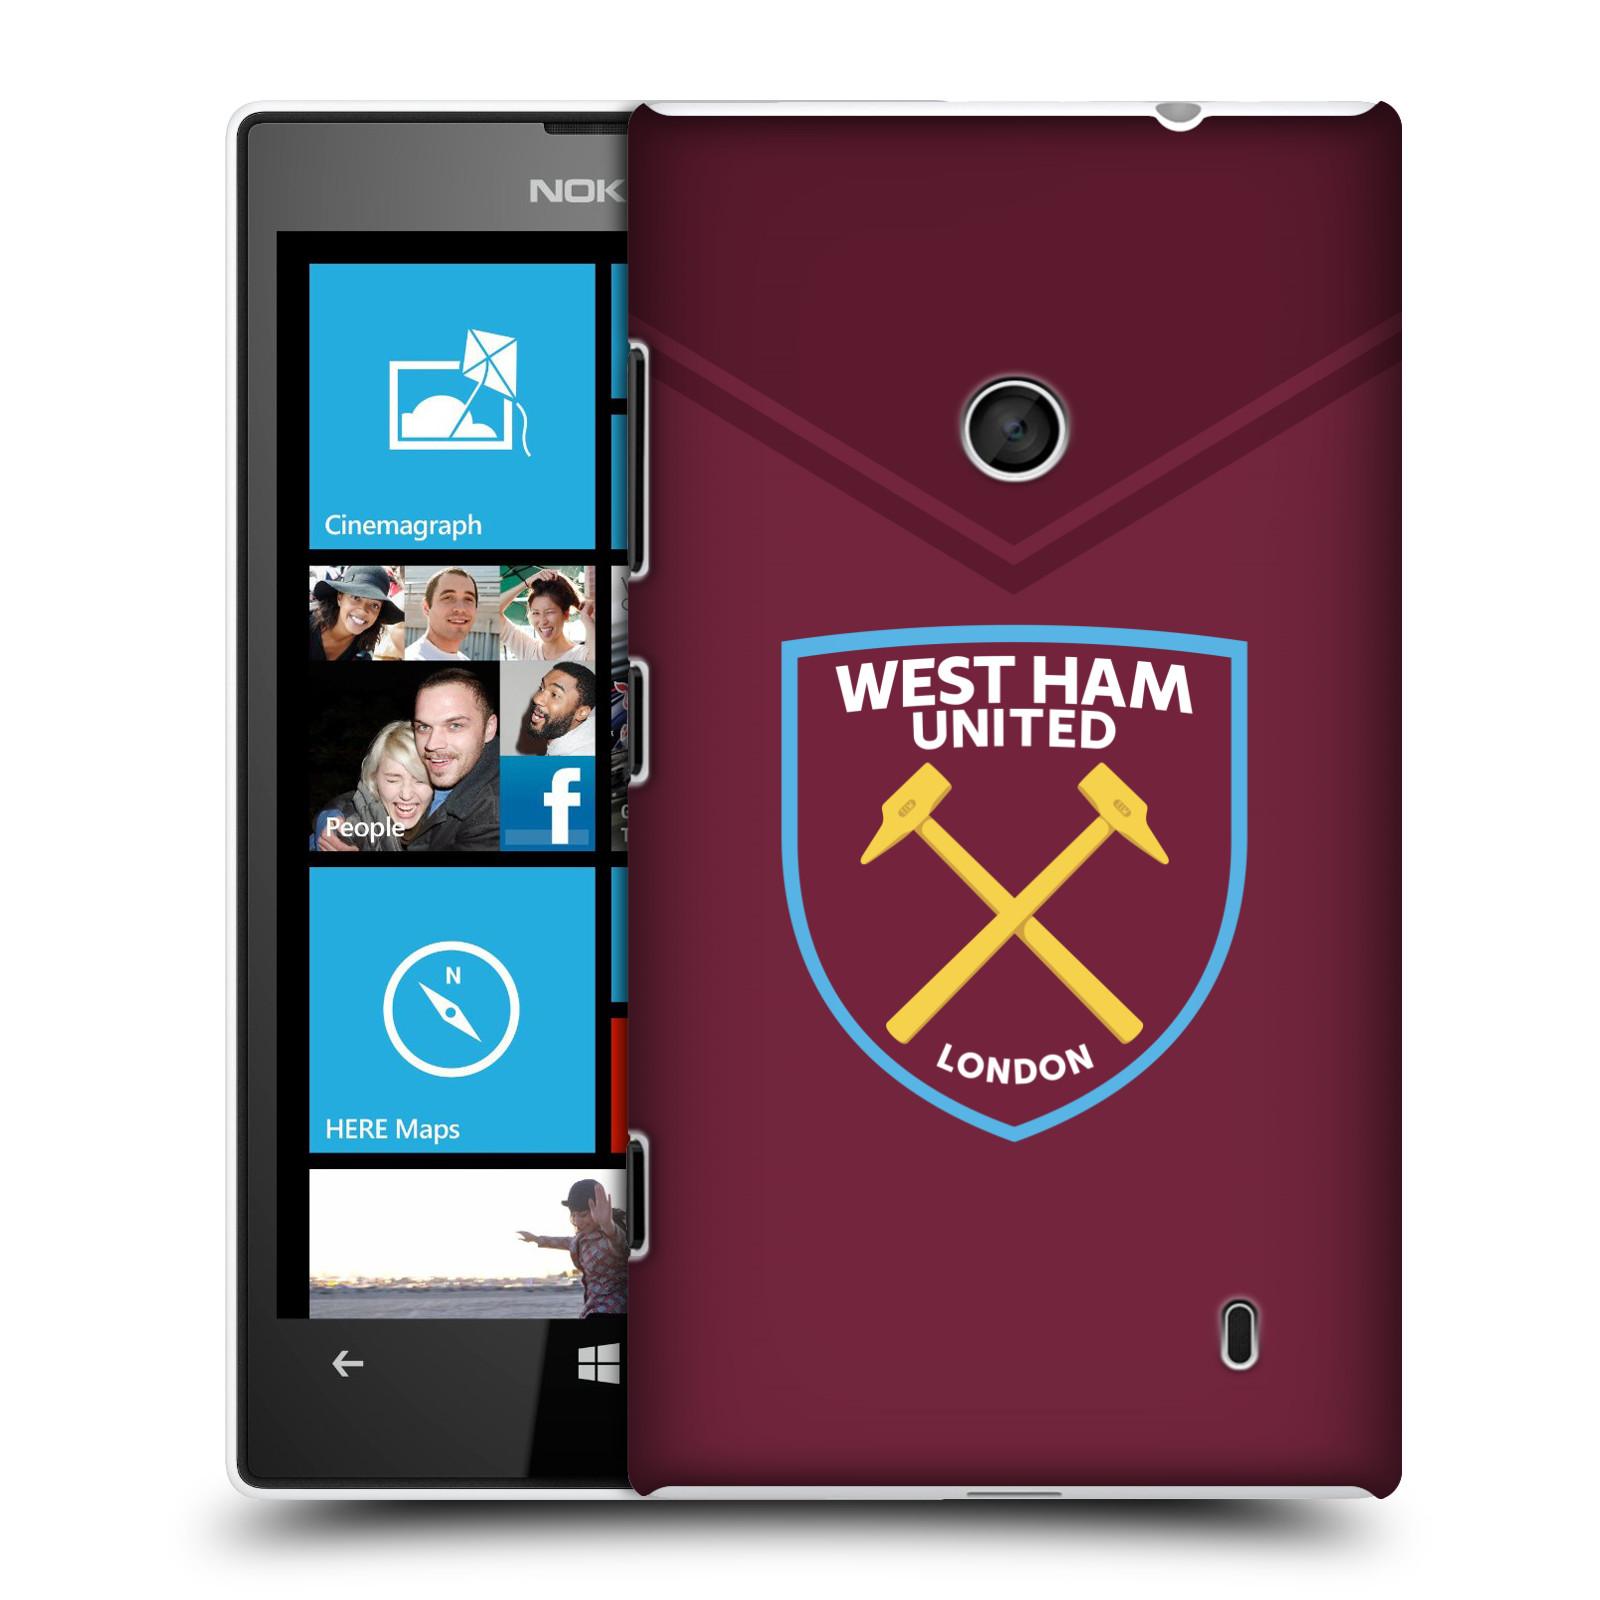 Plastové pouzdro na mobil Nokia Lumia 520 - Head Case - West Ham United - Logo